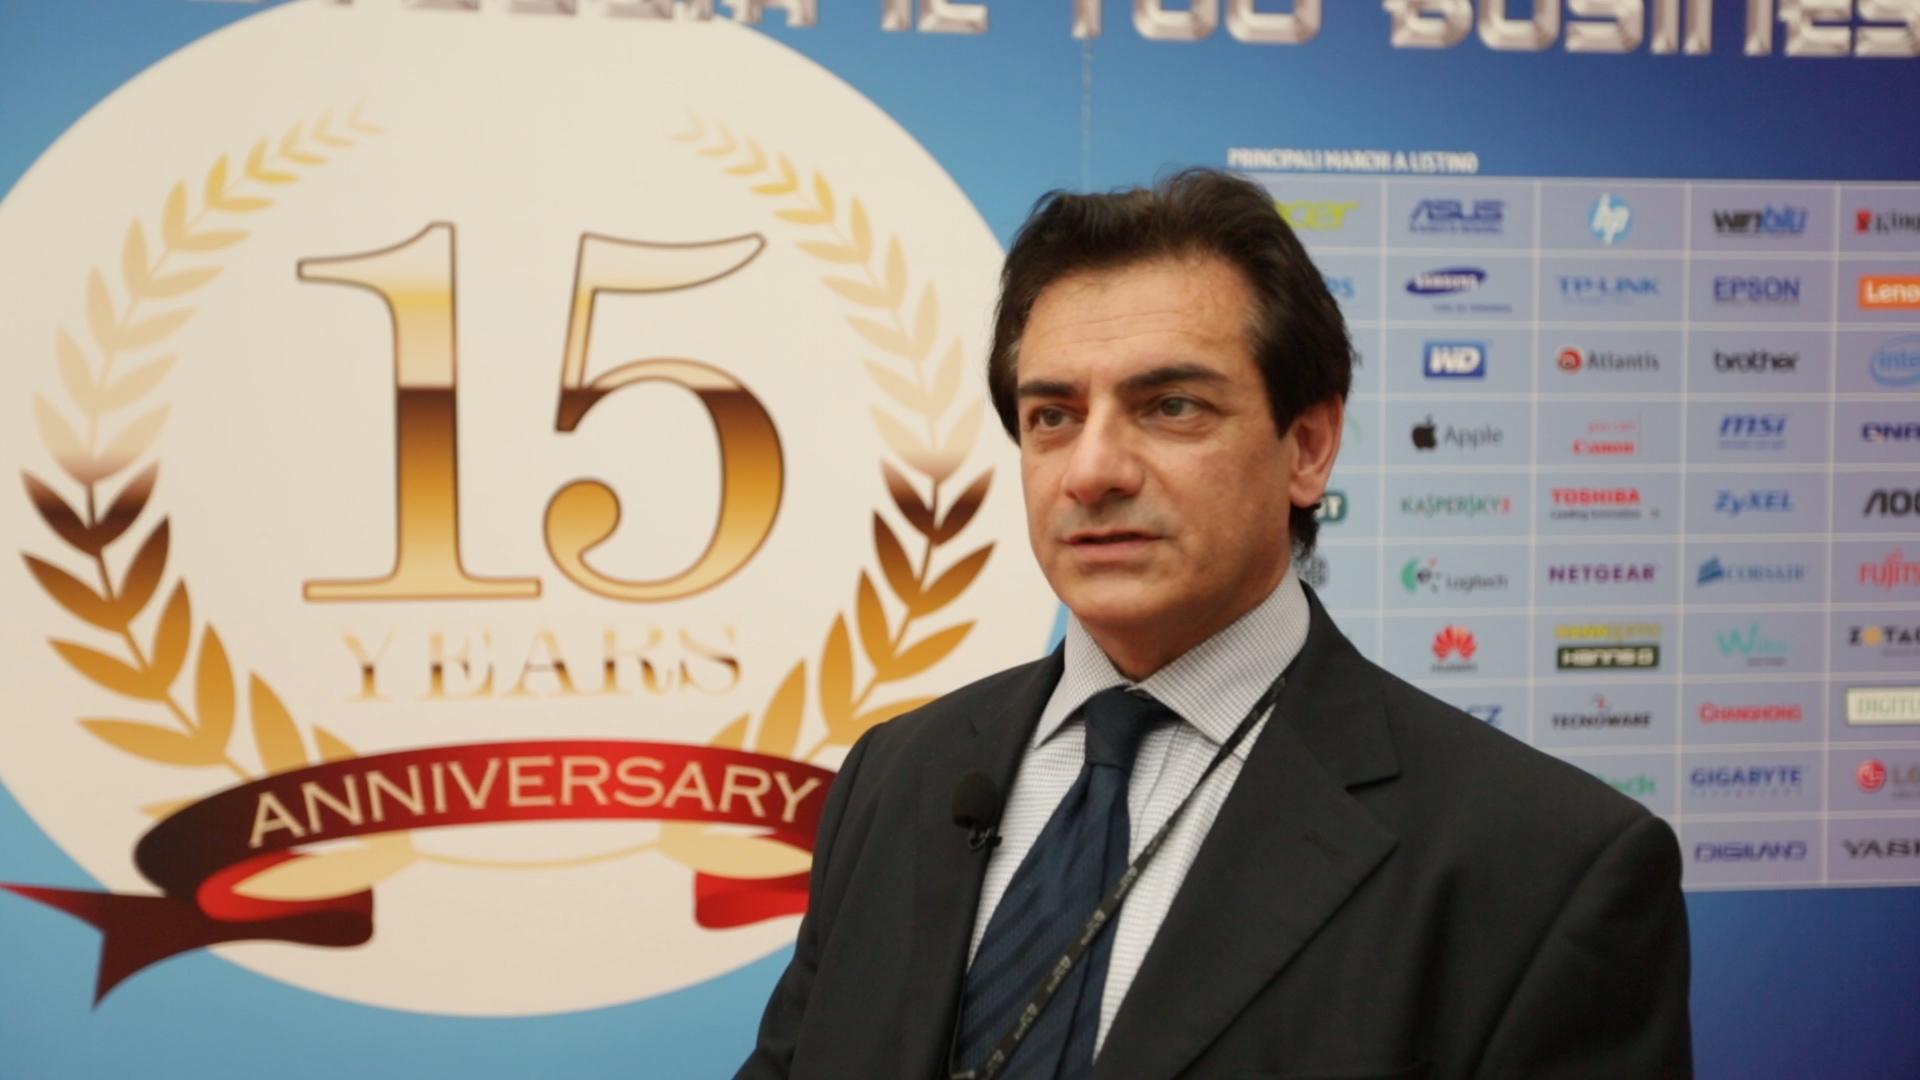 Gianfranco Veronese, Sales manager di Atlantis